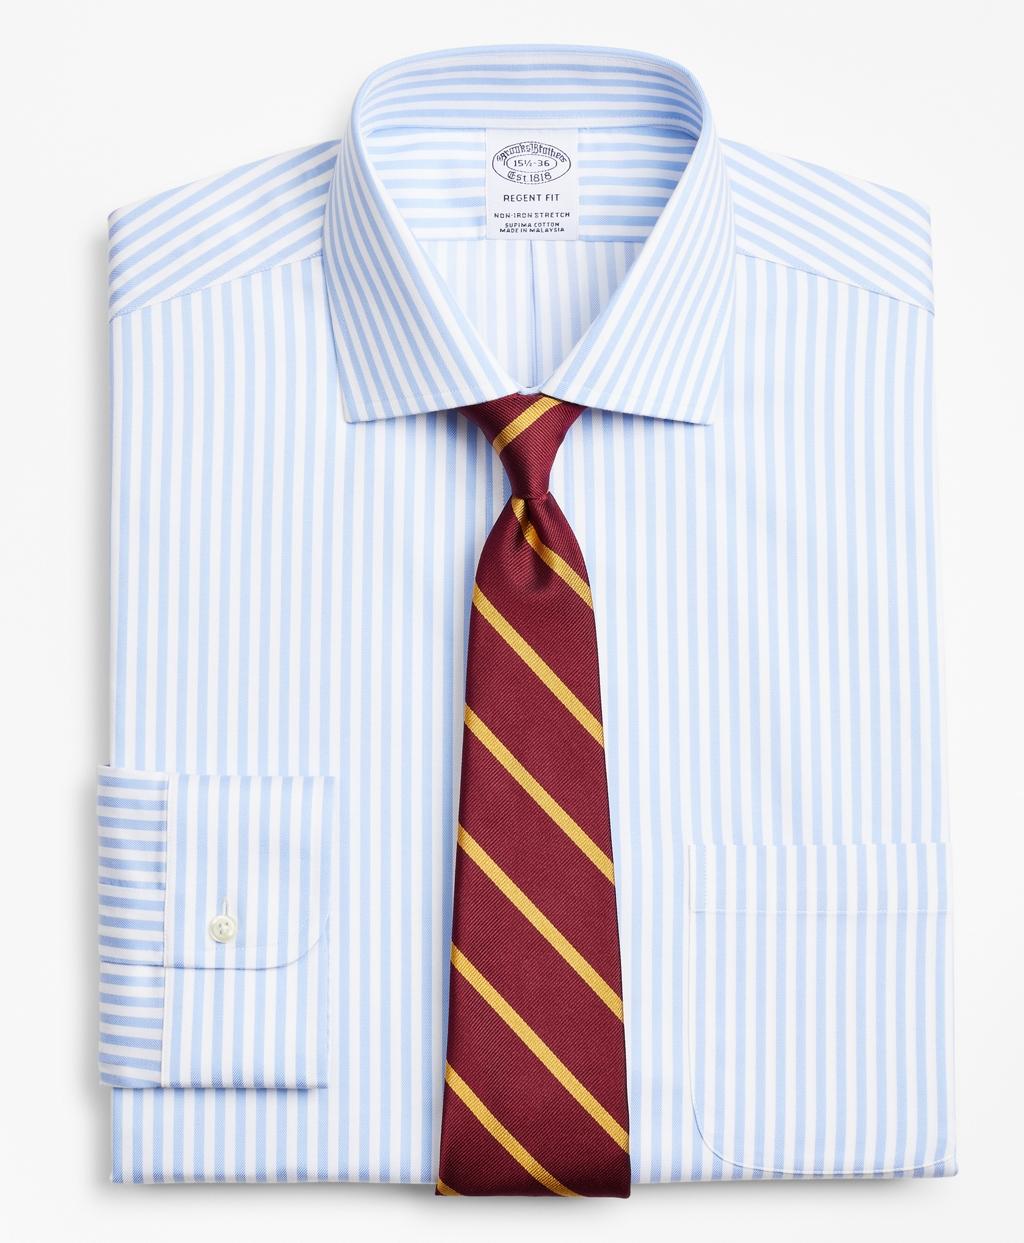 Brooksbrothers Stretch Regent Regular-Fit Dress Shirt, Non-Iron Twill English Collar Bold Stripe